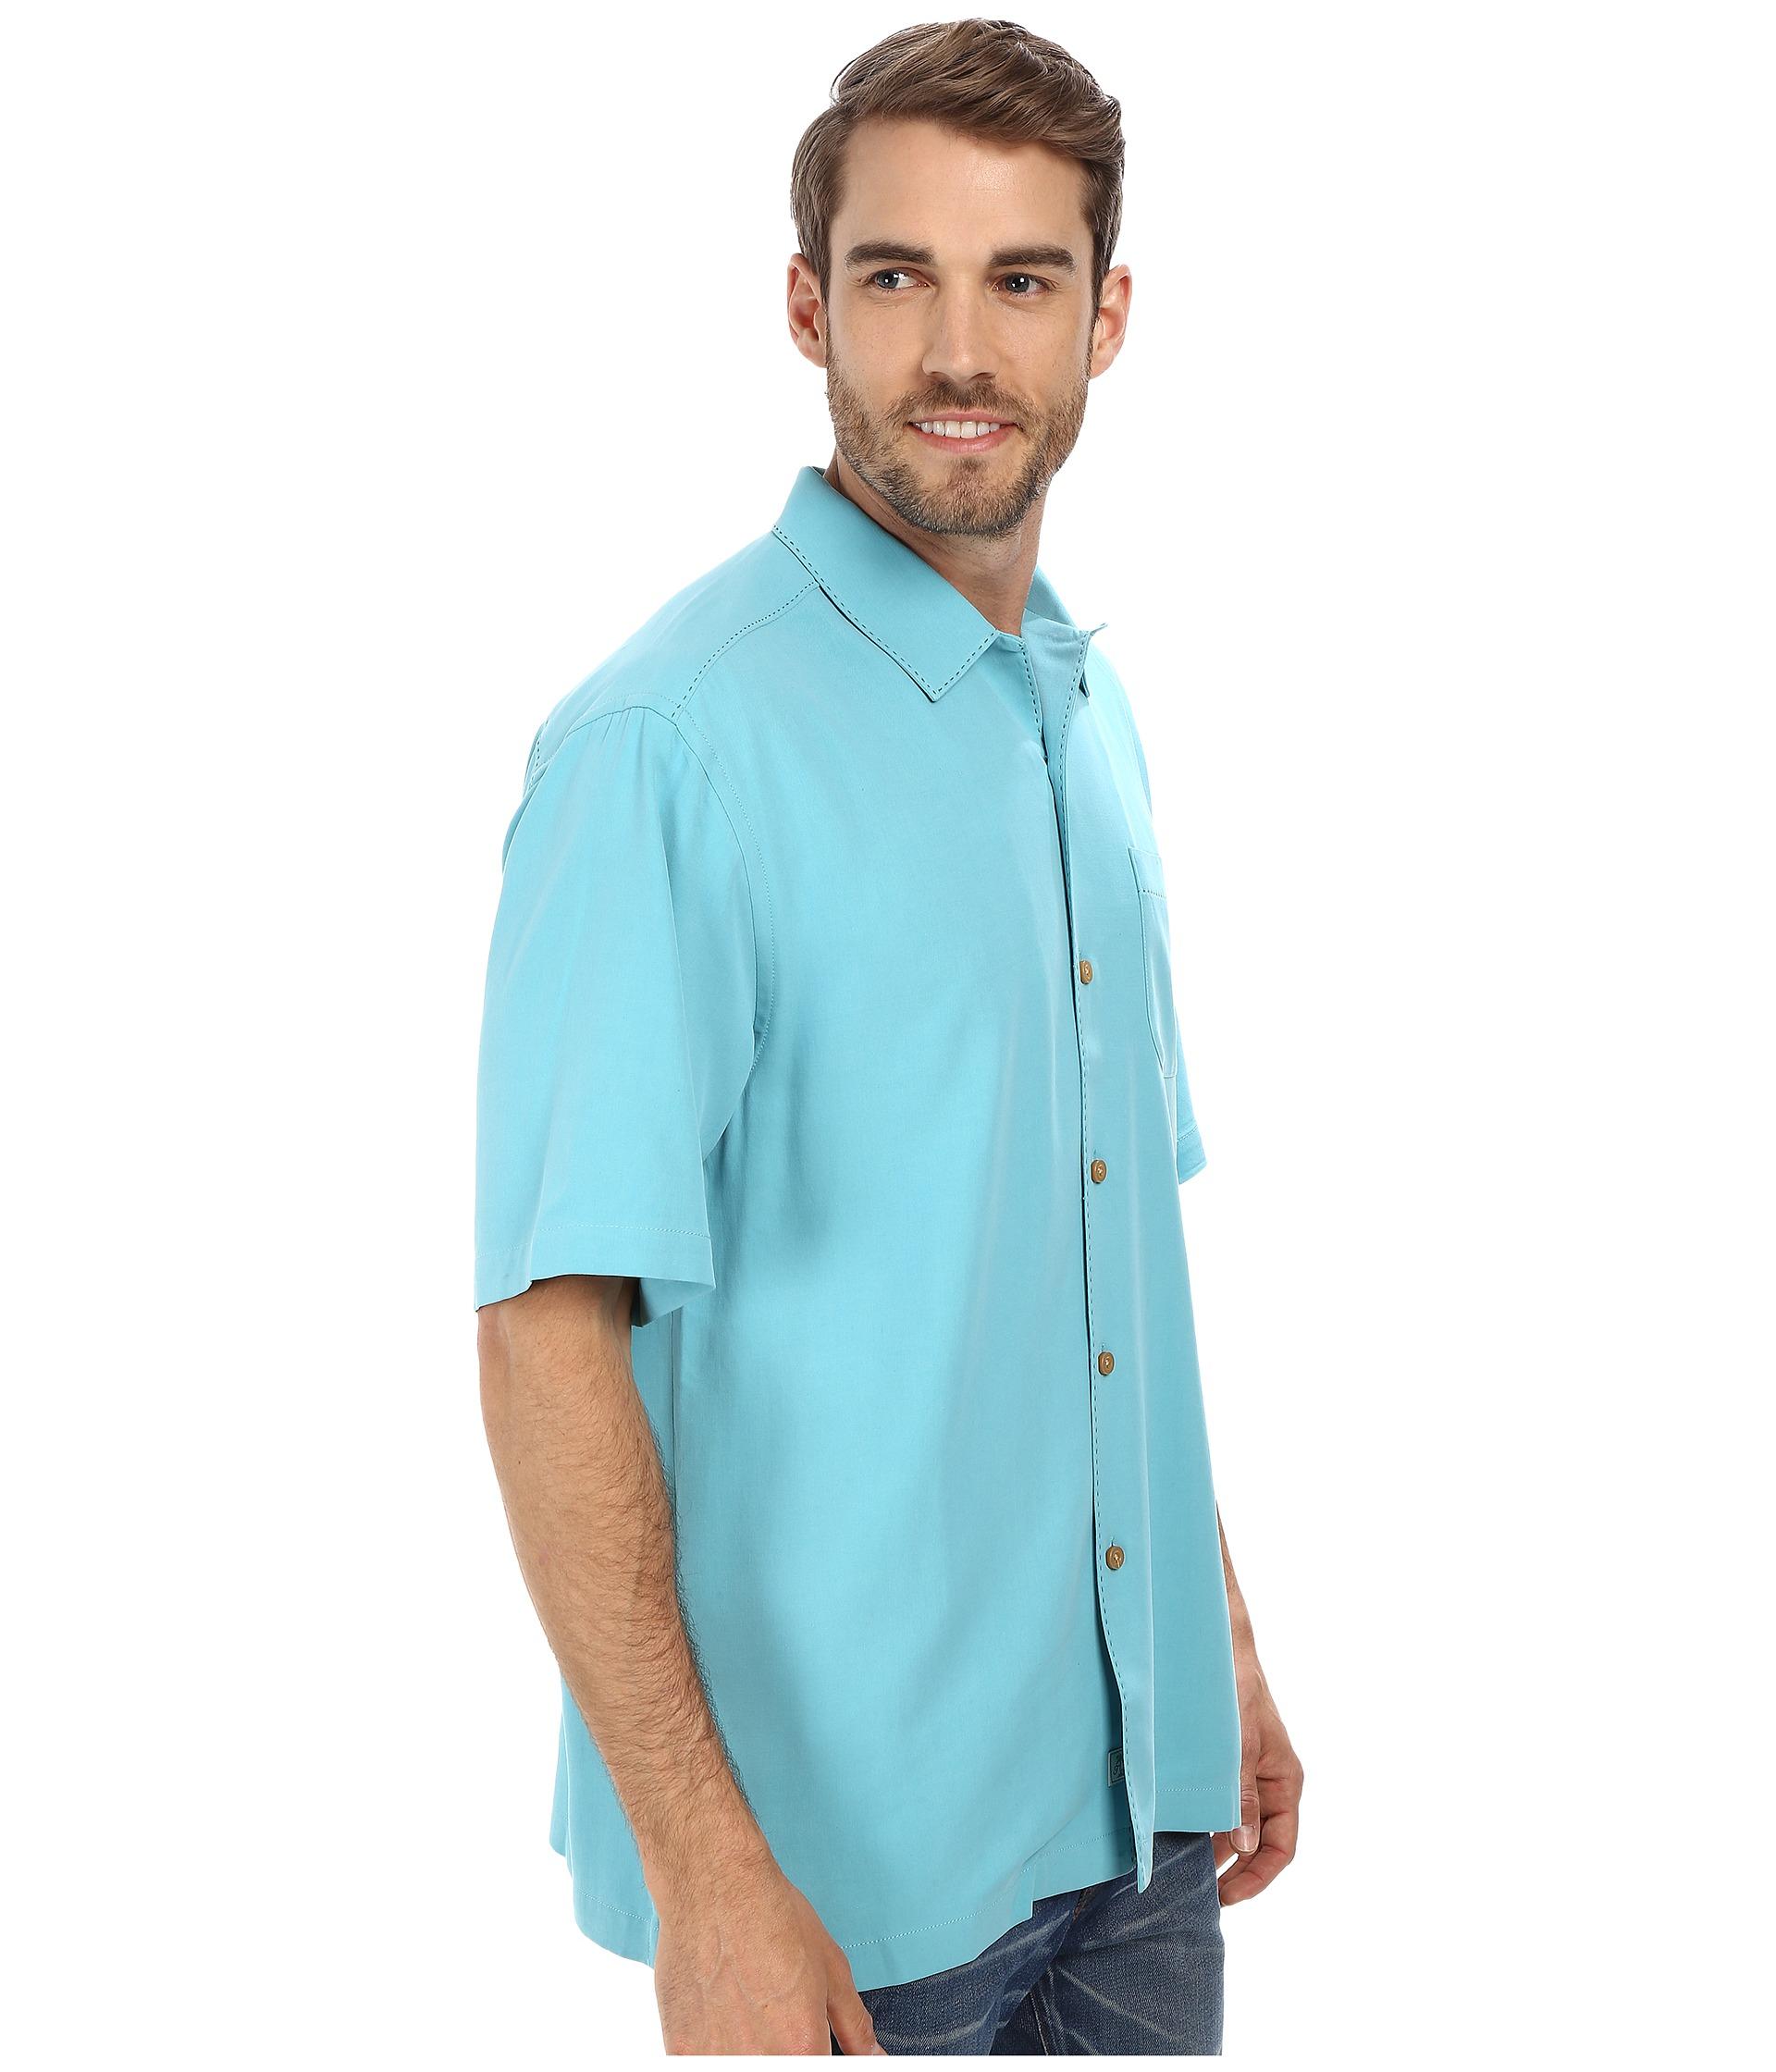 5 stars 100 4 stars 0 3 stars 0 2 stars 0 1 star 0 for Tommy bahama catalina twill silk camp shirt